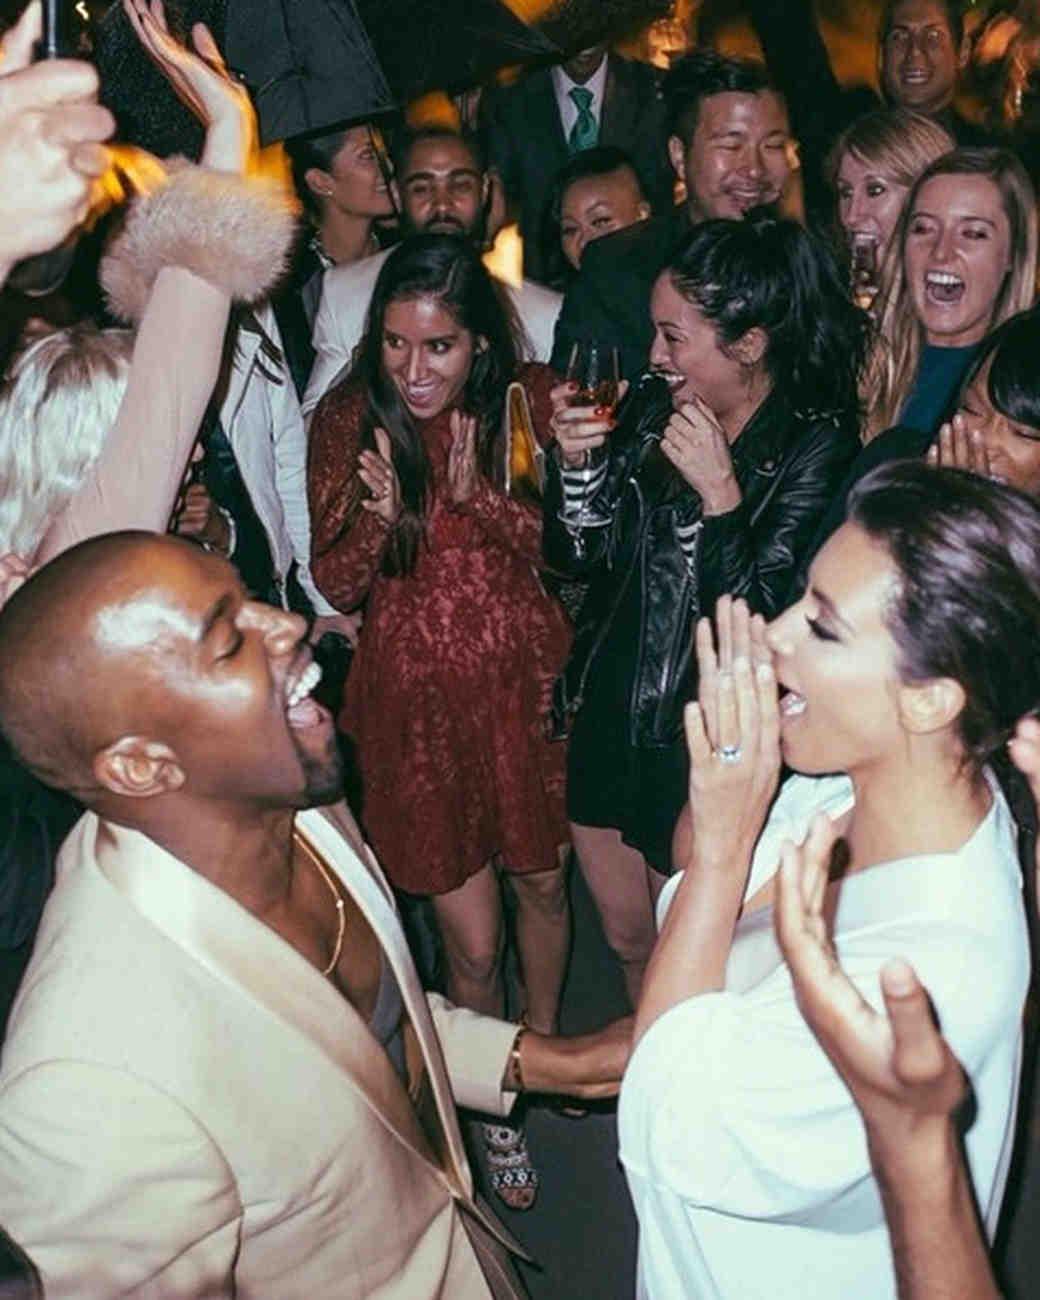 Kanye Kim Wedding: 21 Times Kimye Gave Us Serious #RelationshipGoals